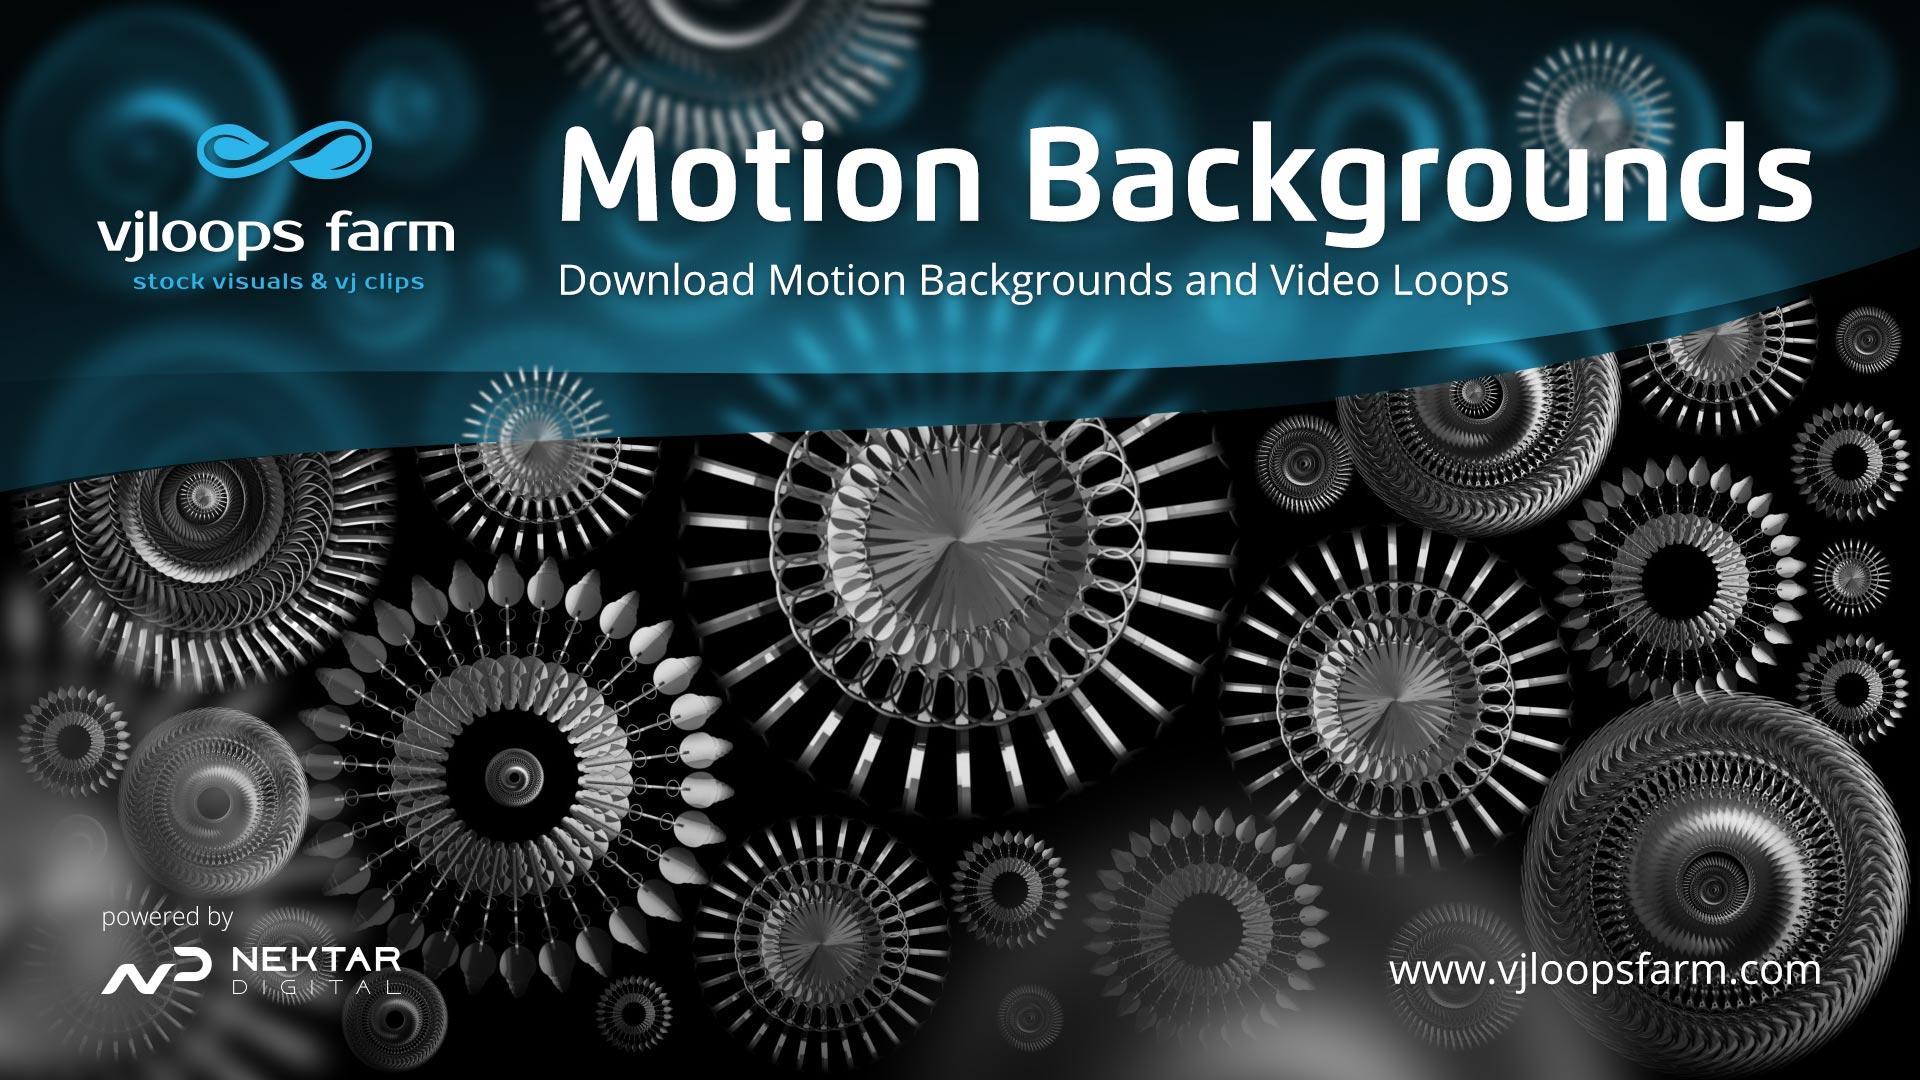 Motion Backgrounds VideoVJ Backgrounds VJ Loops Farm